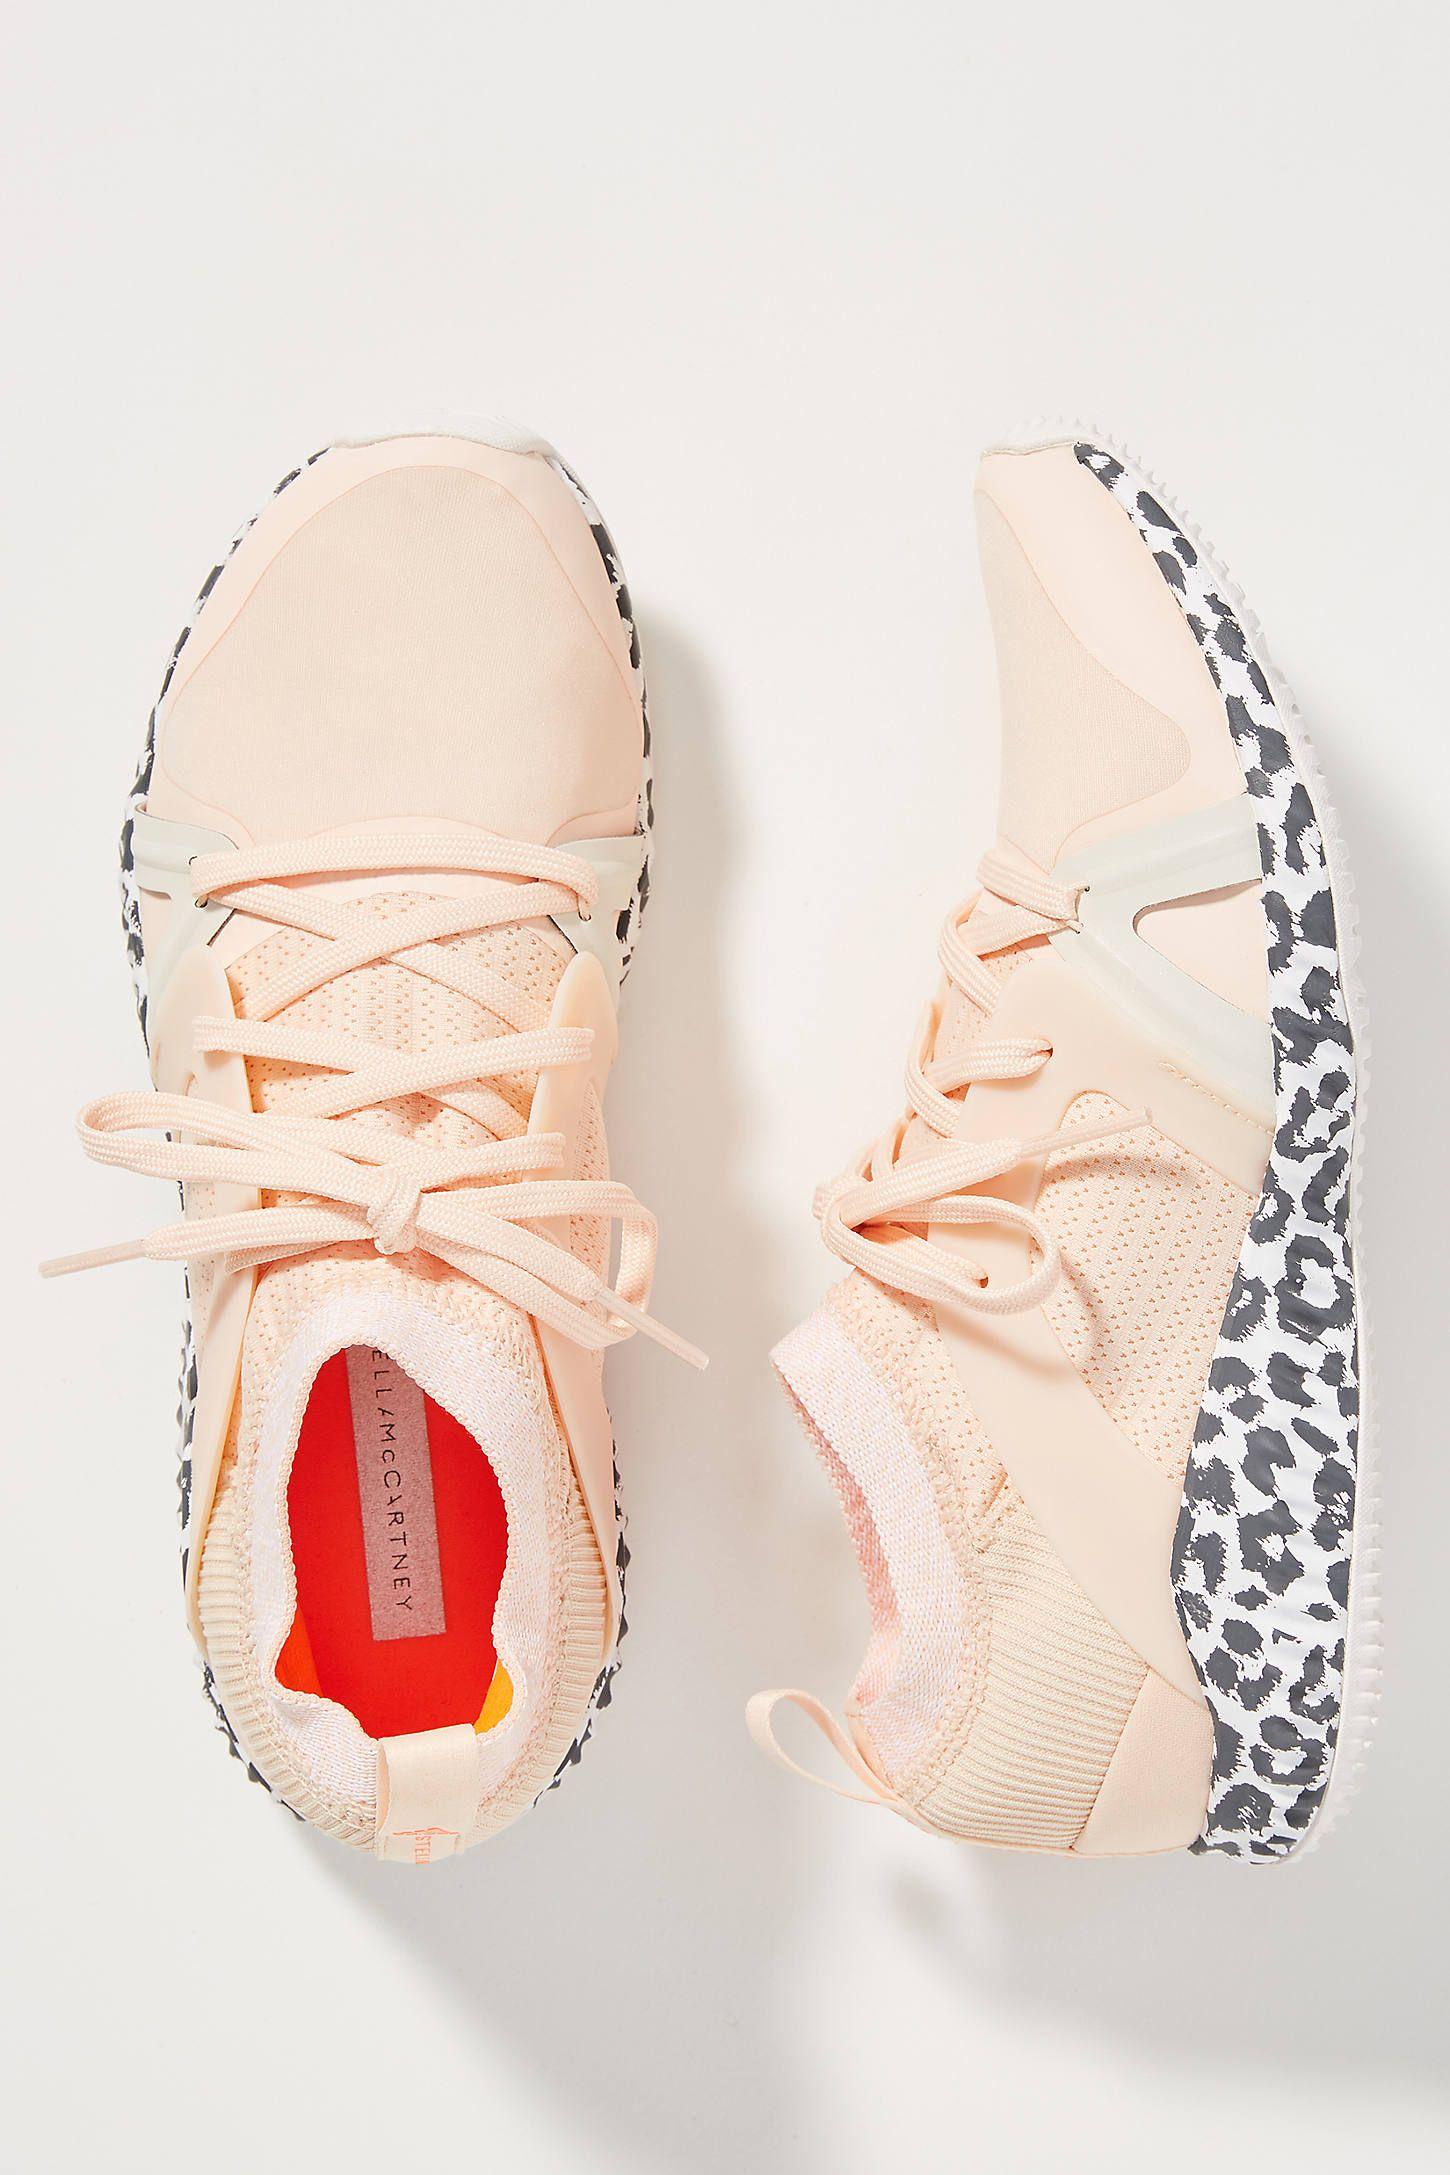 Adidas by Stella McCartney Peach Leopard Sneakers